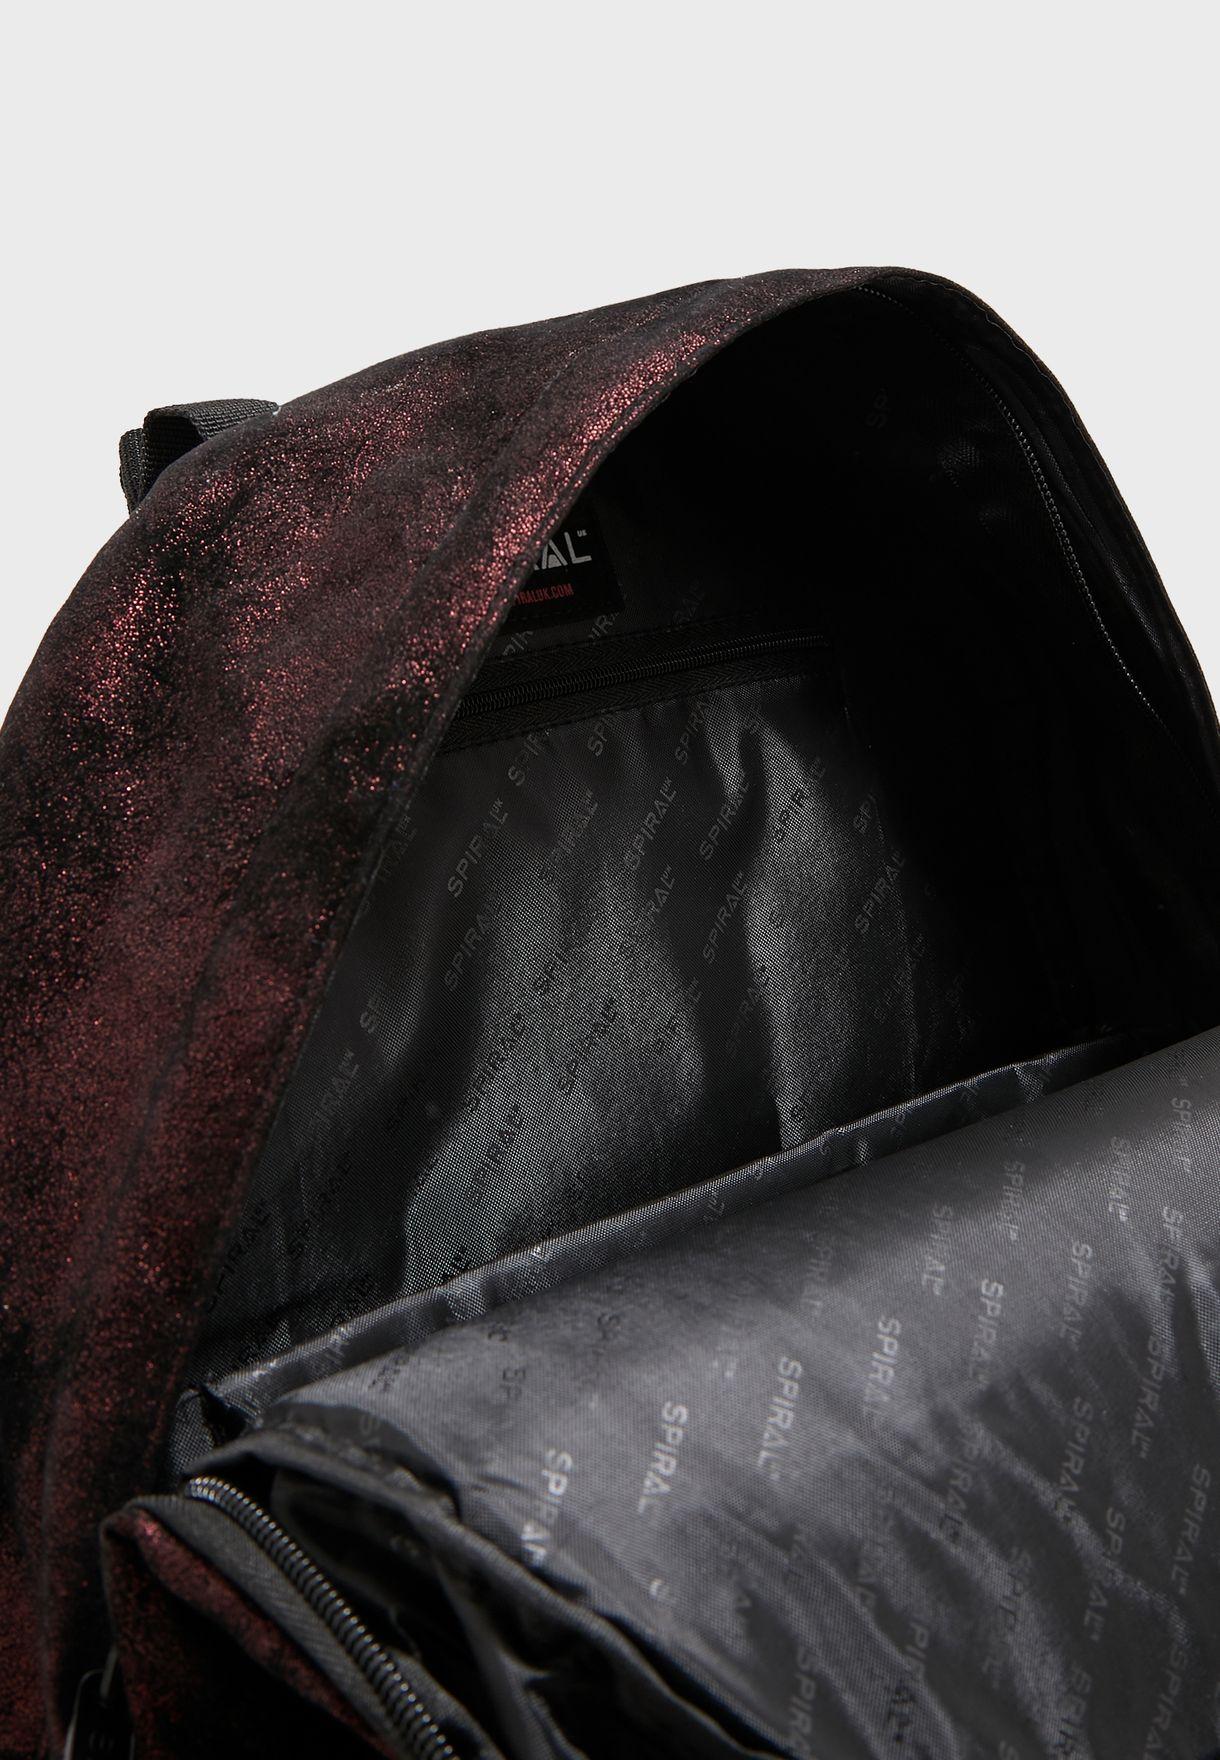 حقيبة ظهر بجيب امامي ذو سحاب